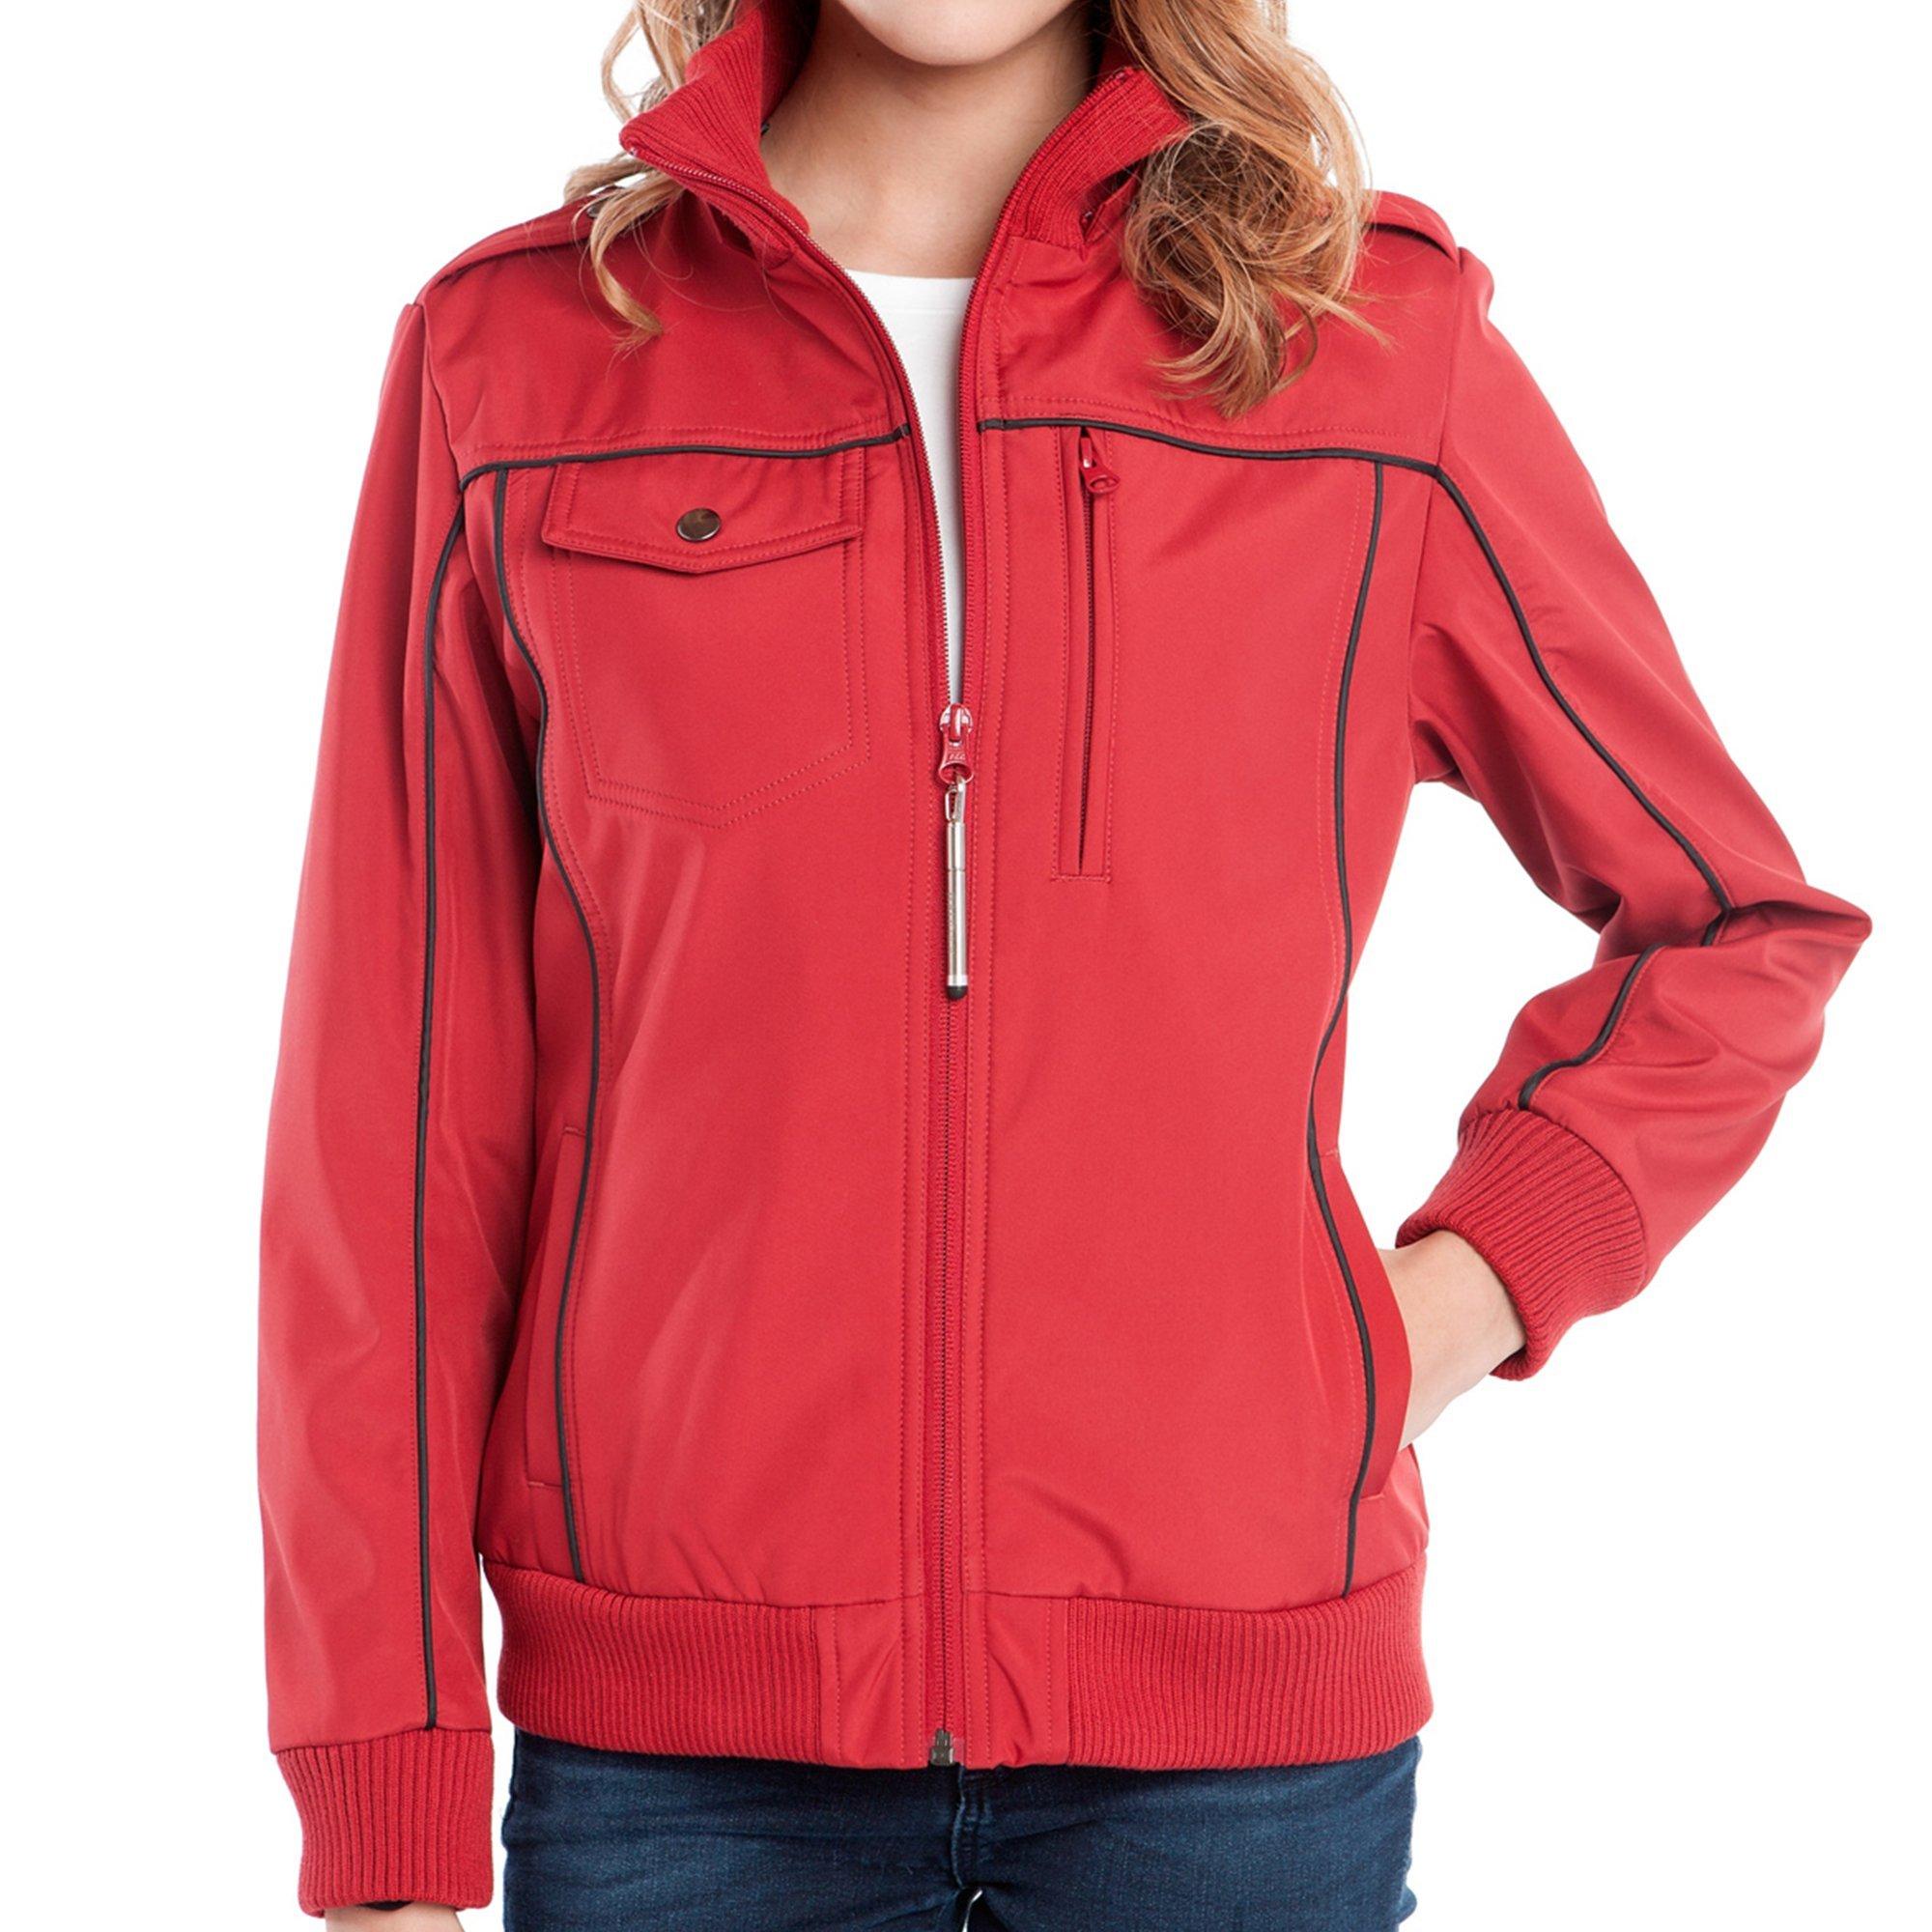 Baubax Travel Jacket - Bomber - Female - Red - Small